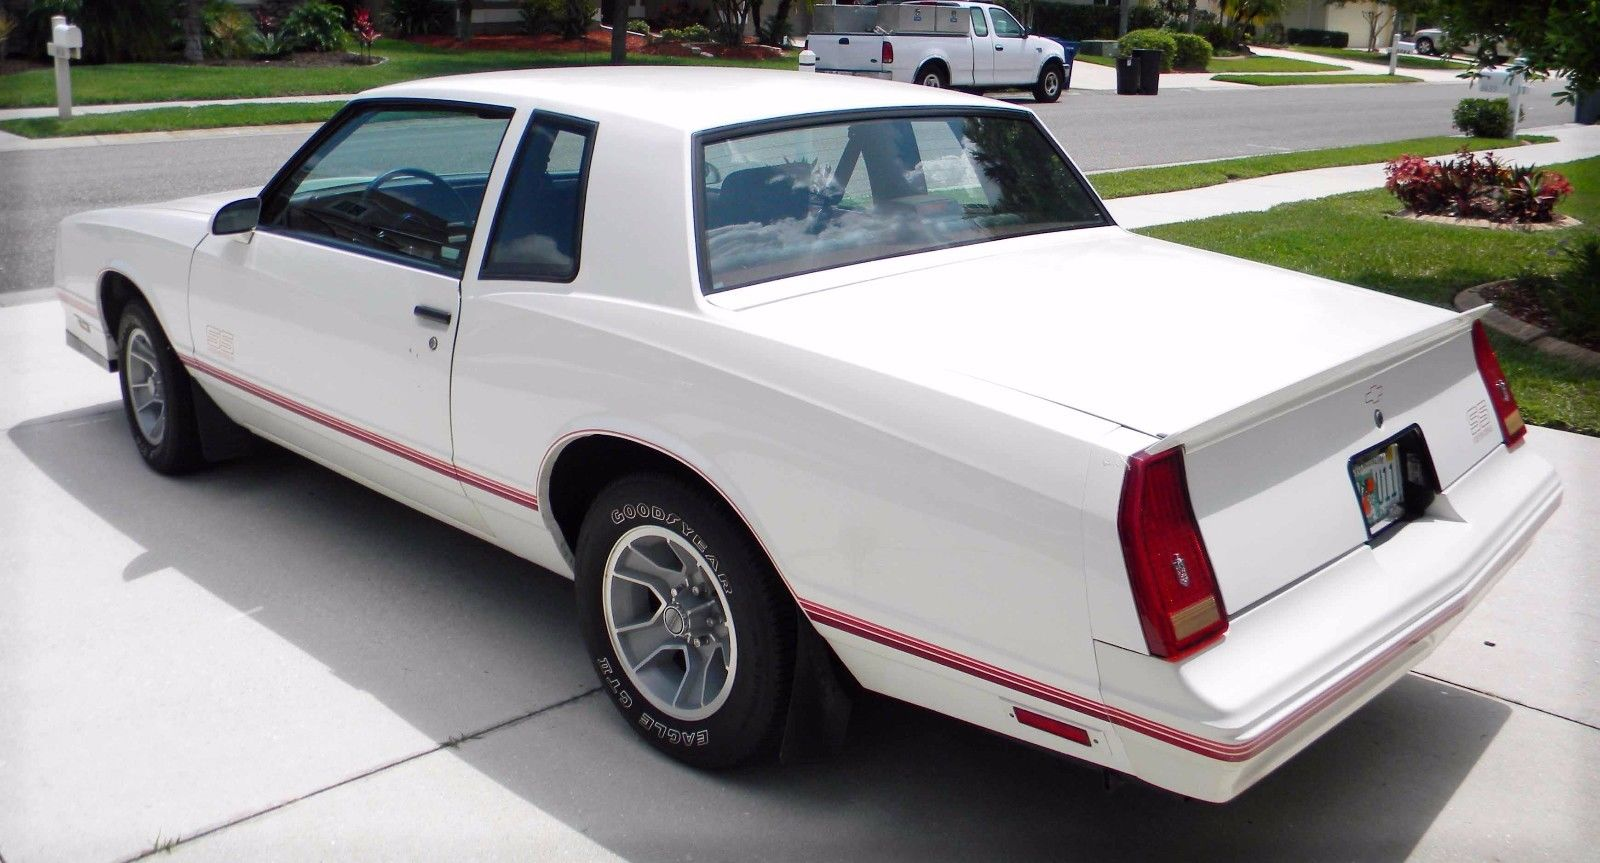 1987 Chevrolet Monte Carlo SS Rear 3/4 View